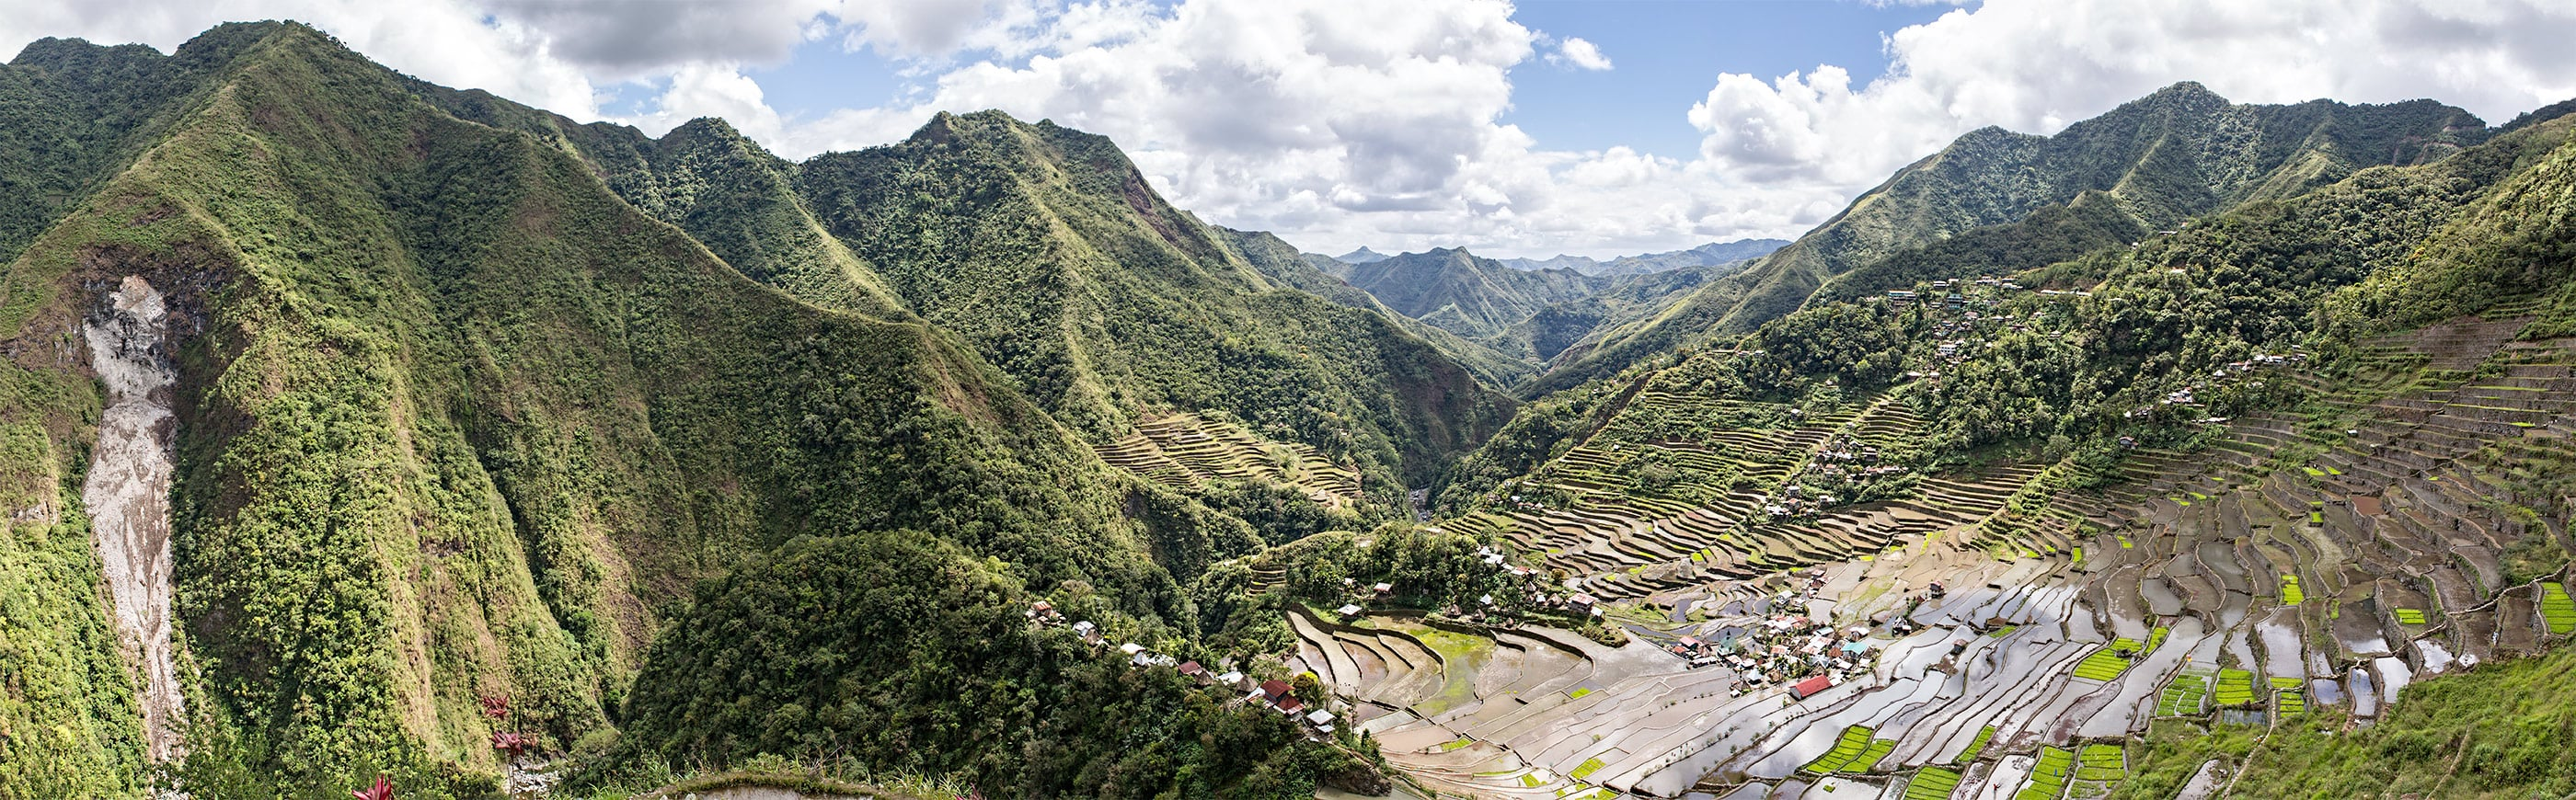 Batad Panorama